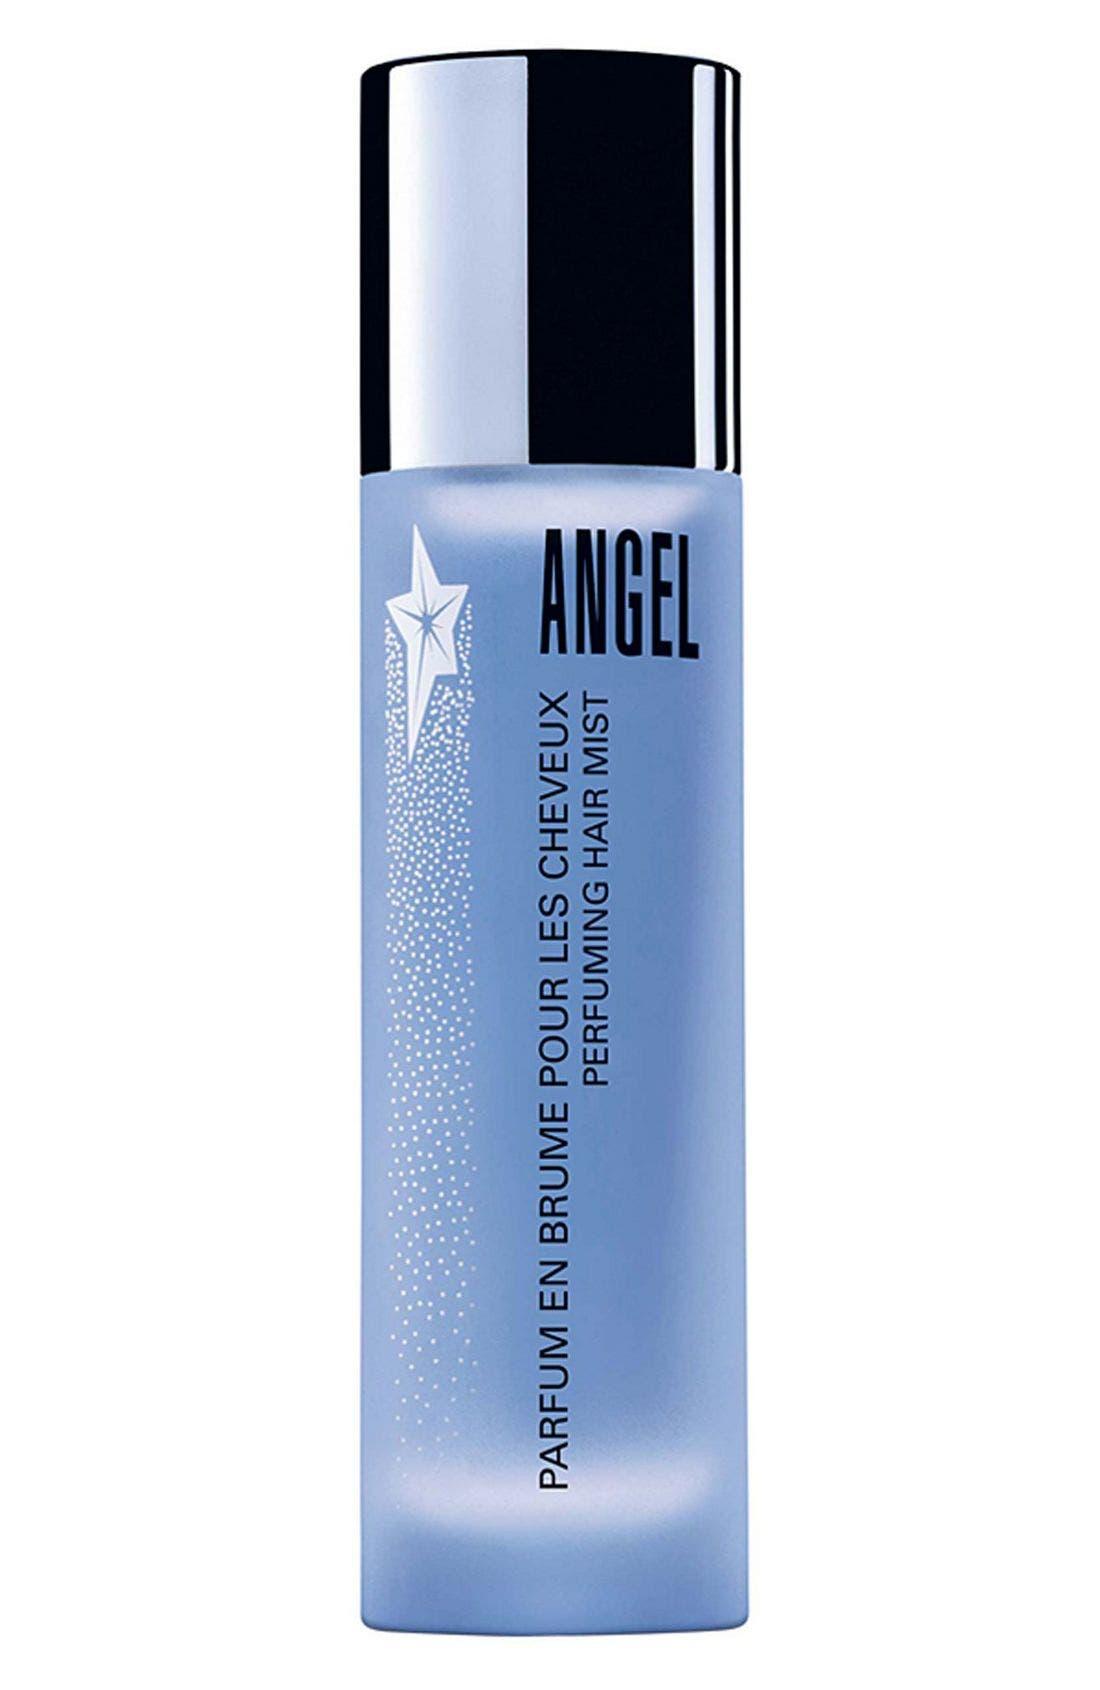 Angel by Mugler Perfuming Hair Mist